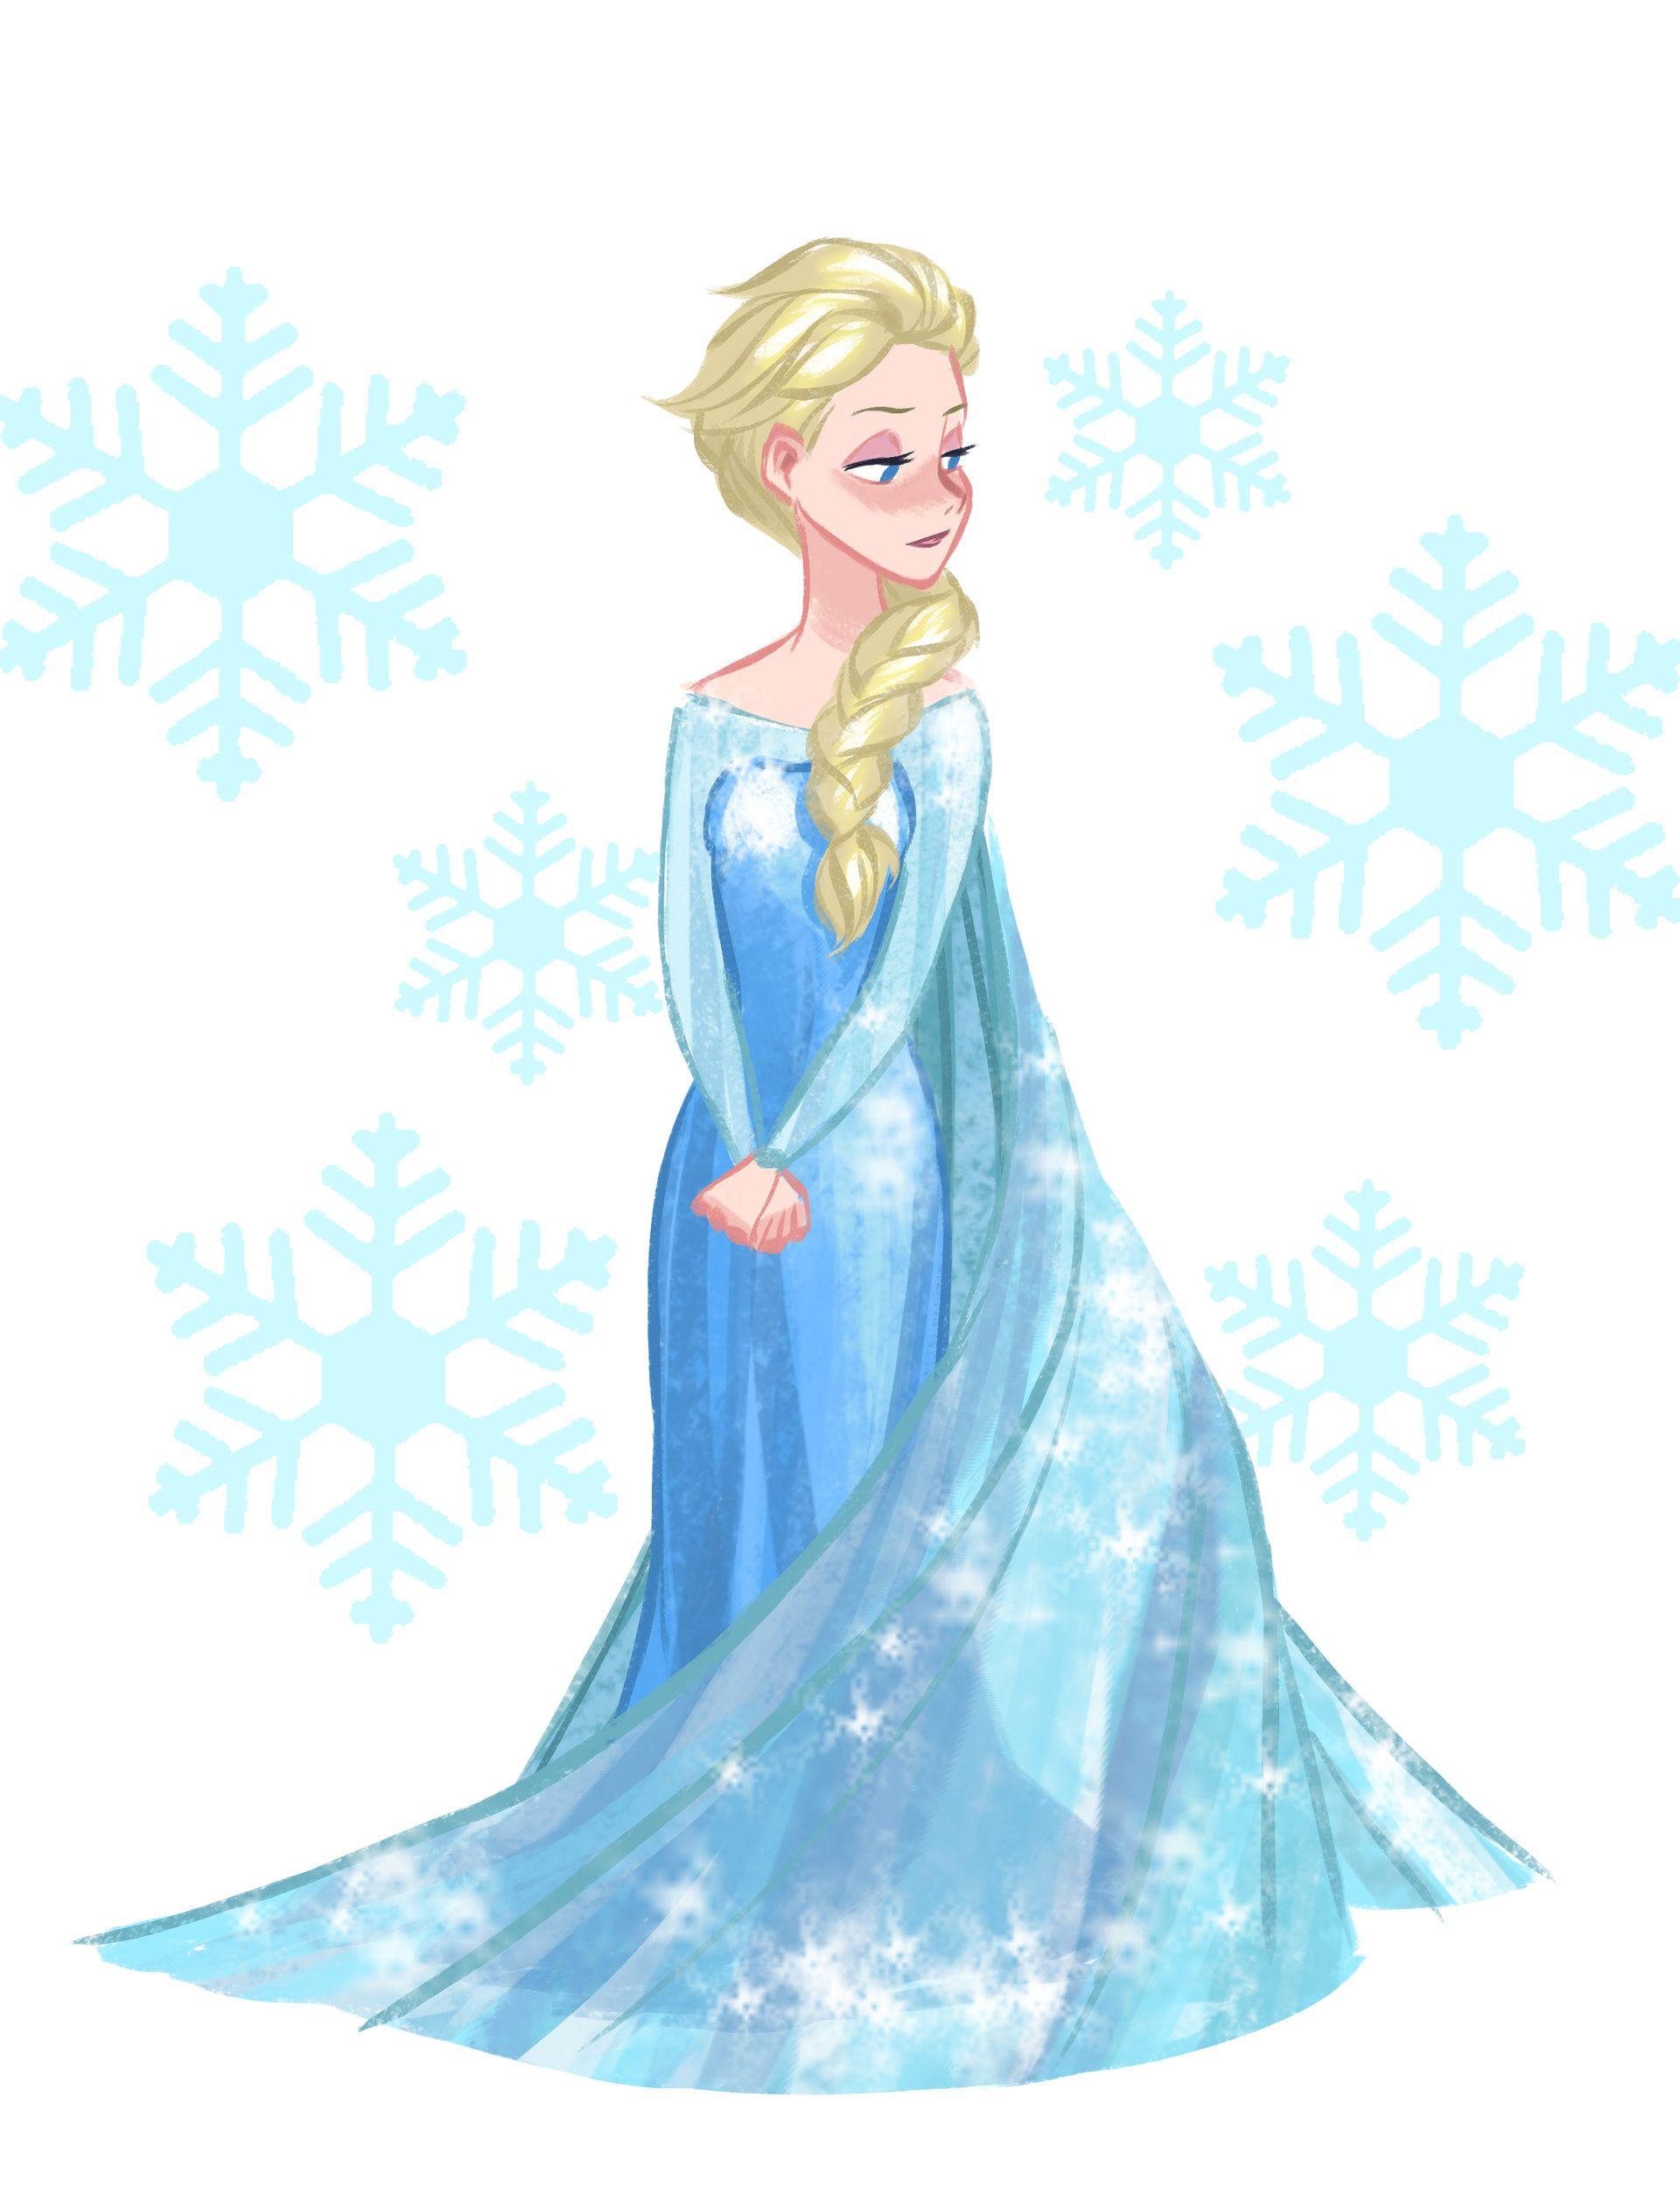 Artstation fan art del. Elsa clipart russell